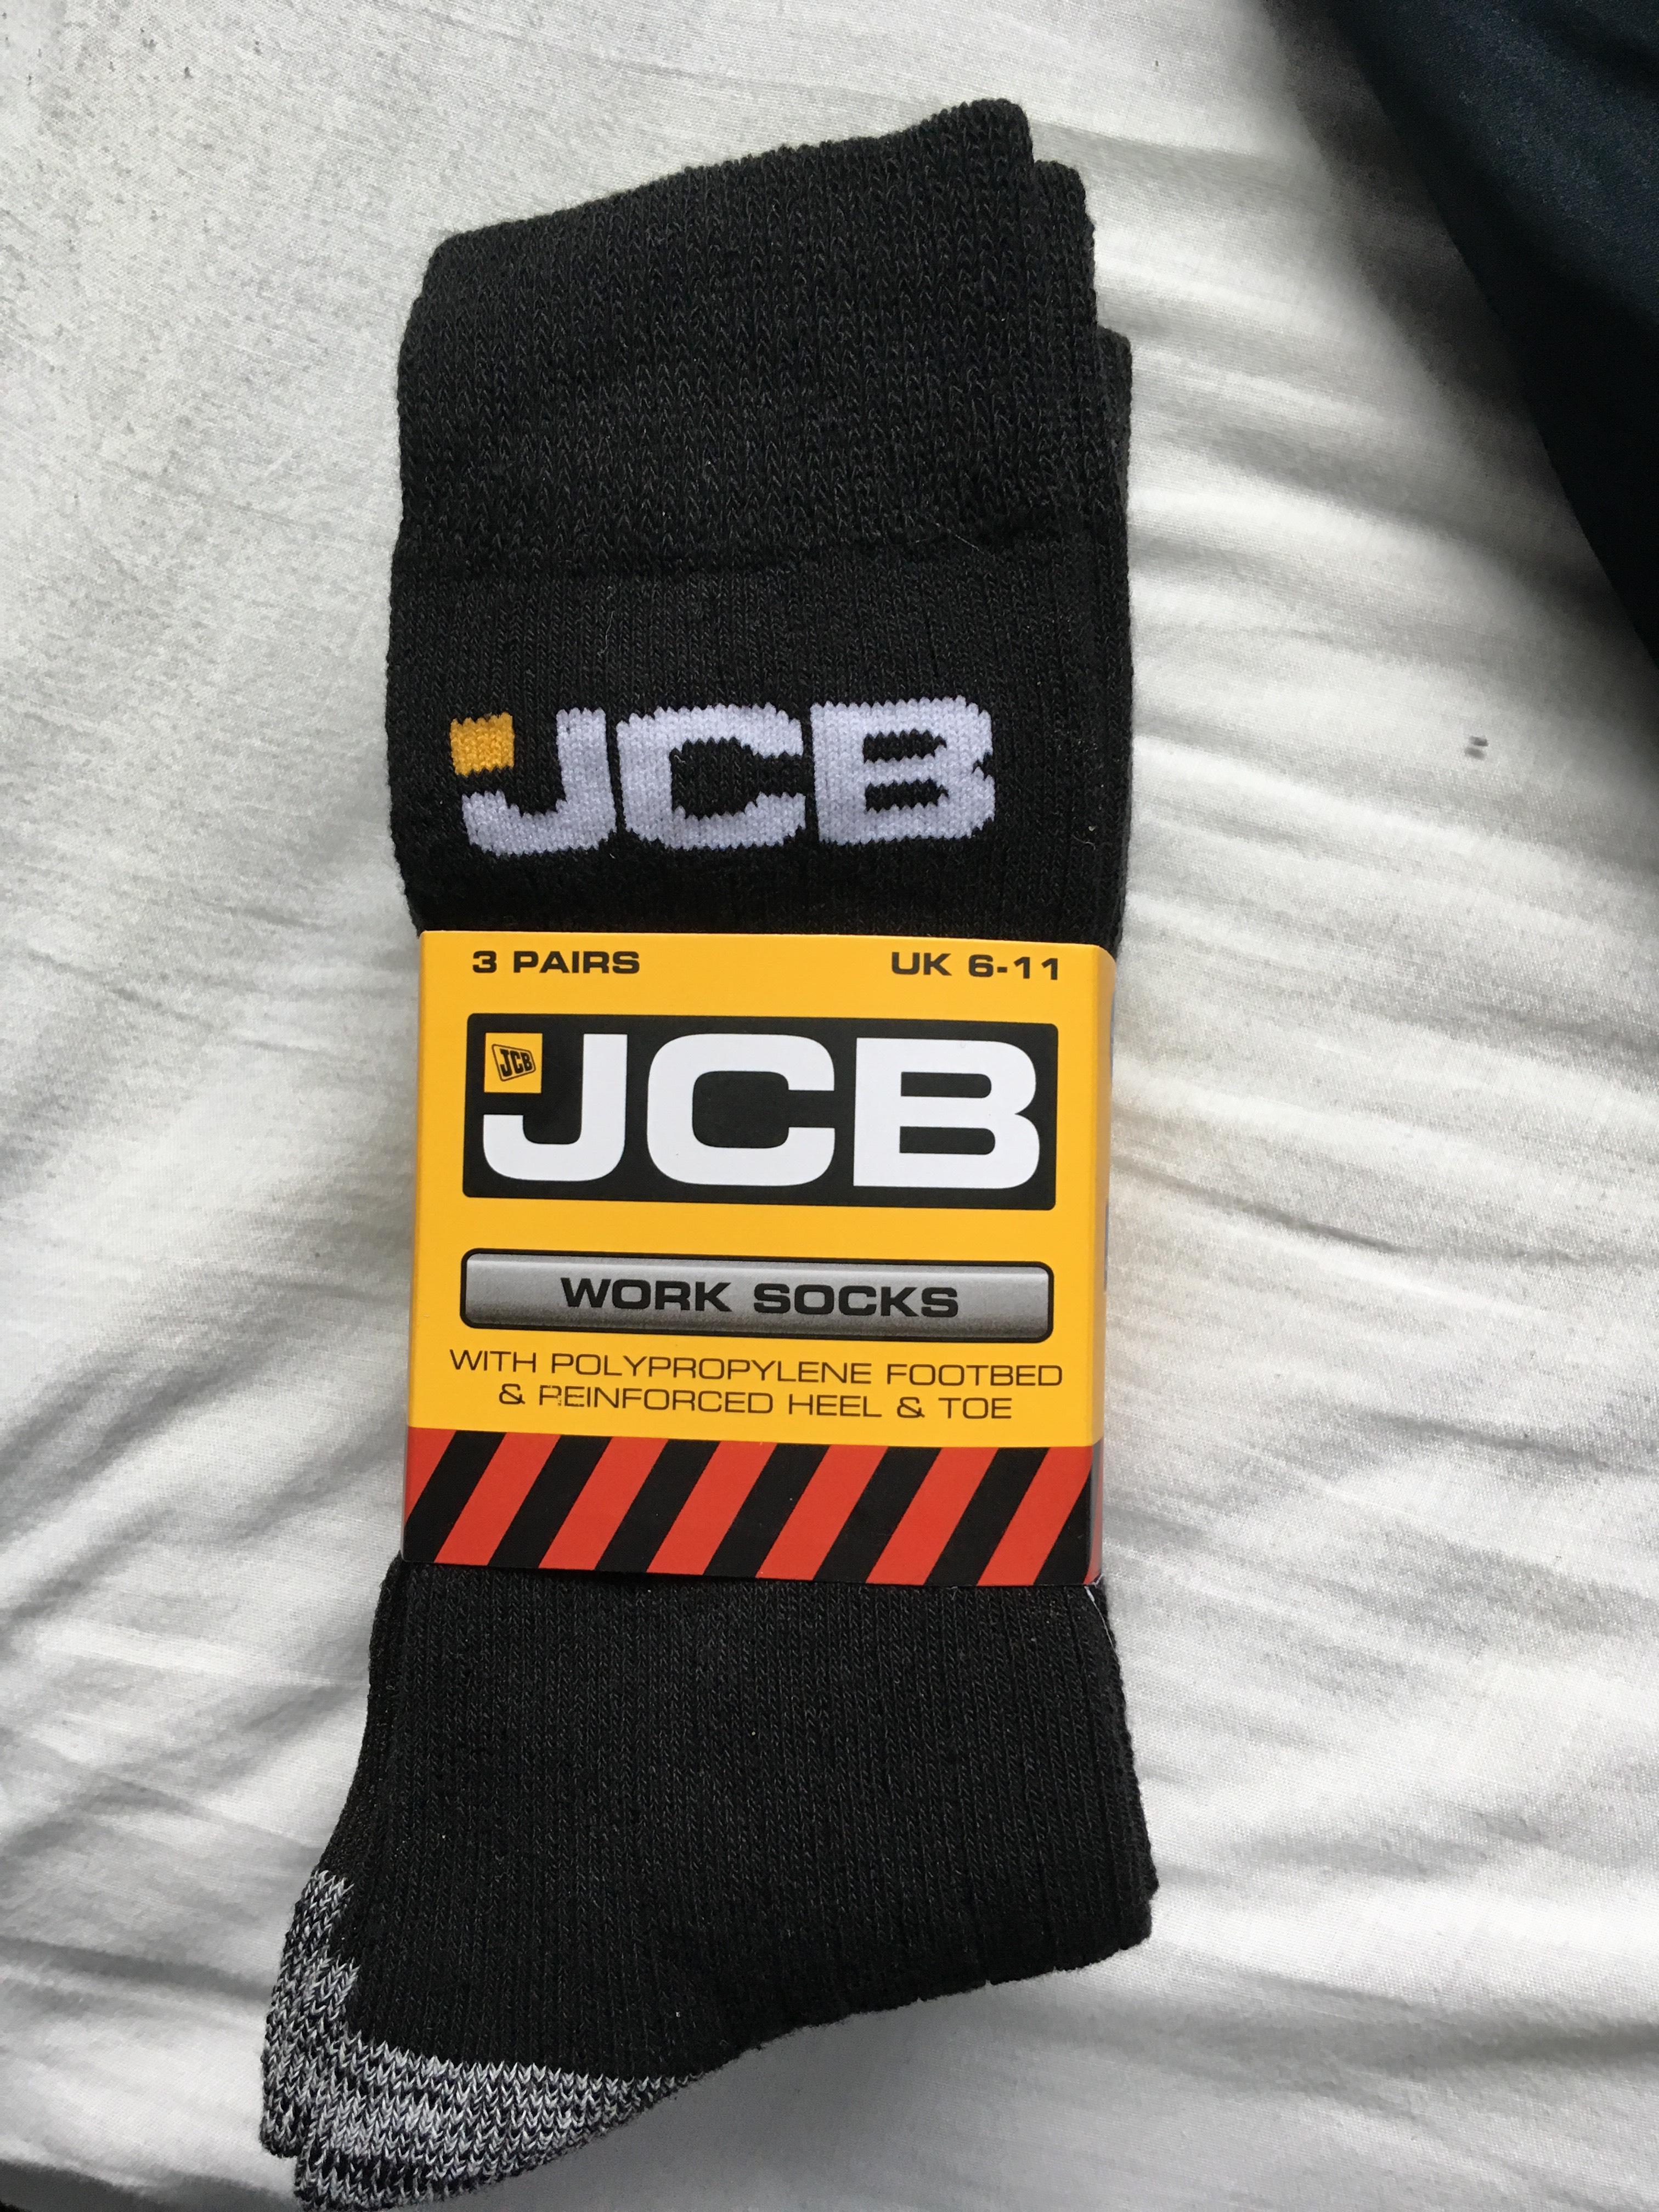 JCB branded men's socks (3 pairs) was £5.99 now 99p at Aldi